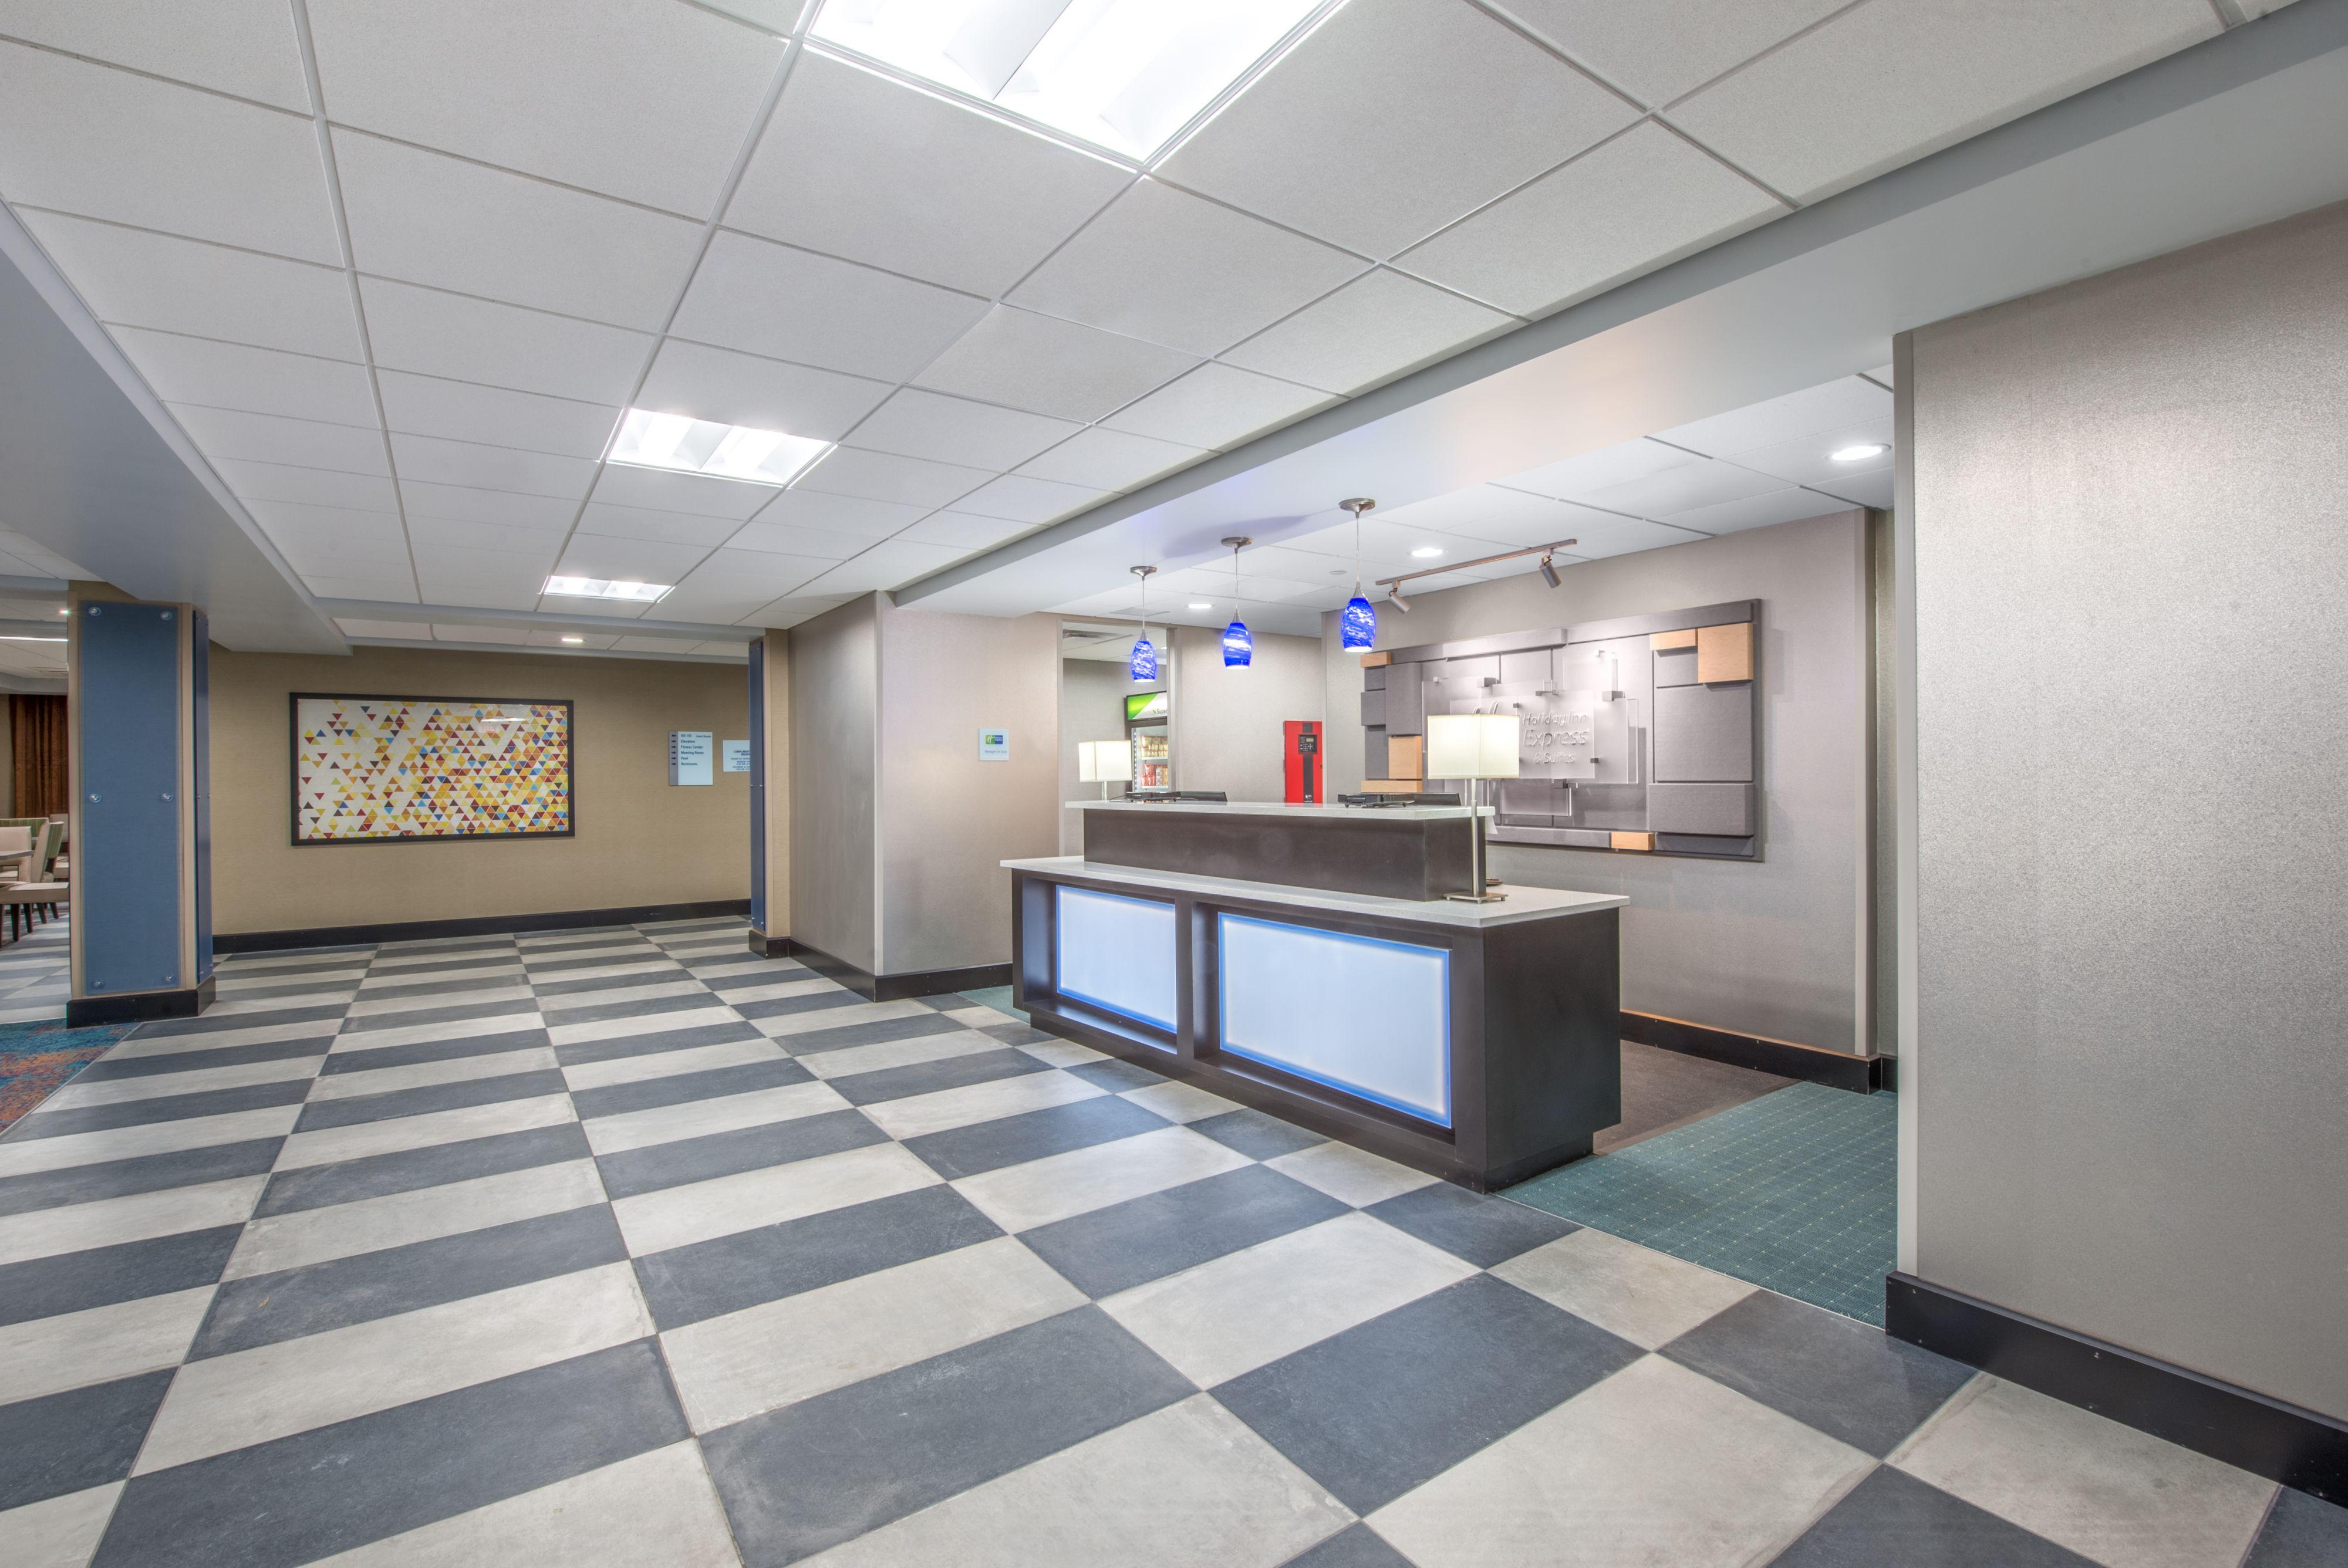 Holiday Inn Express & Suites Shawnee-Kansas City West image 5